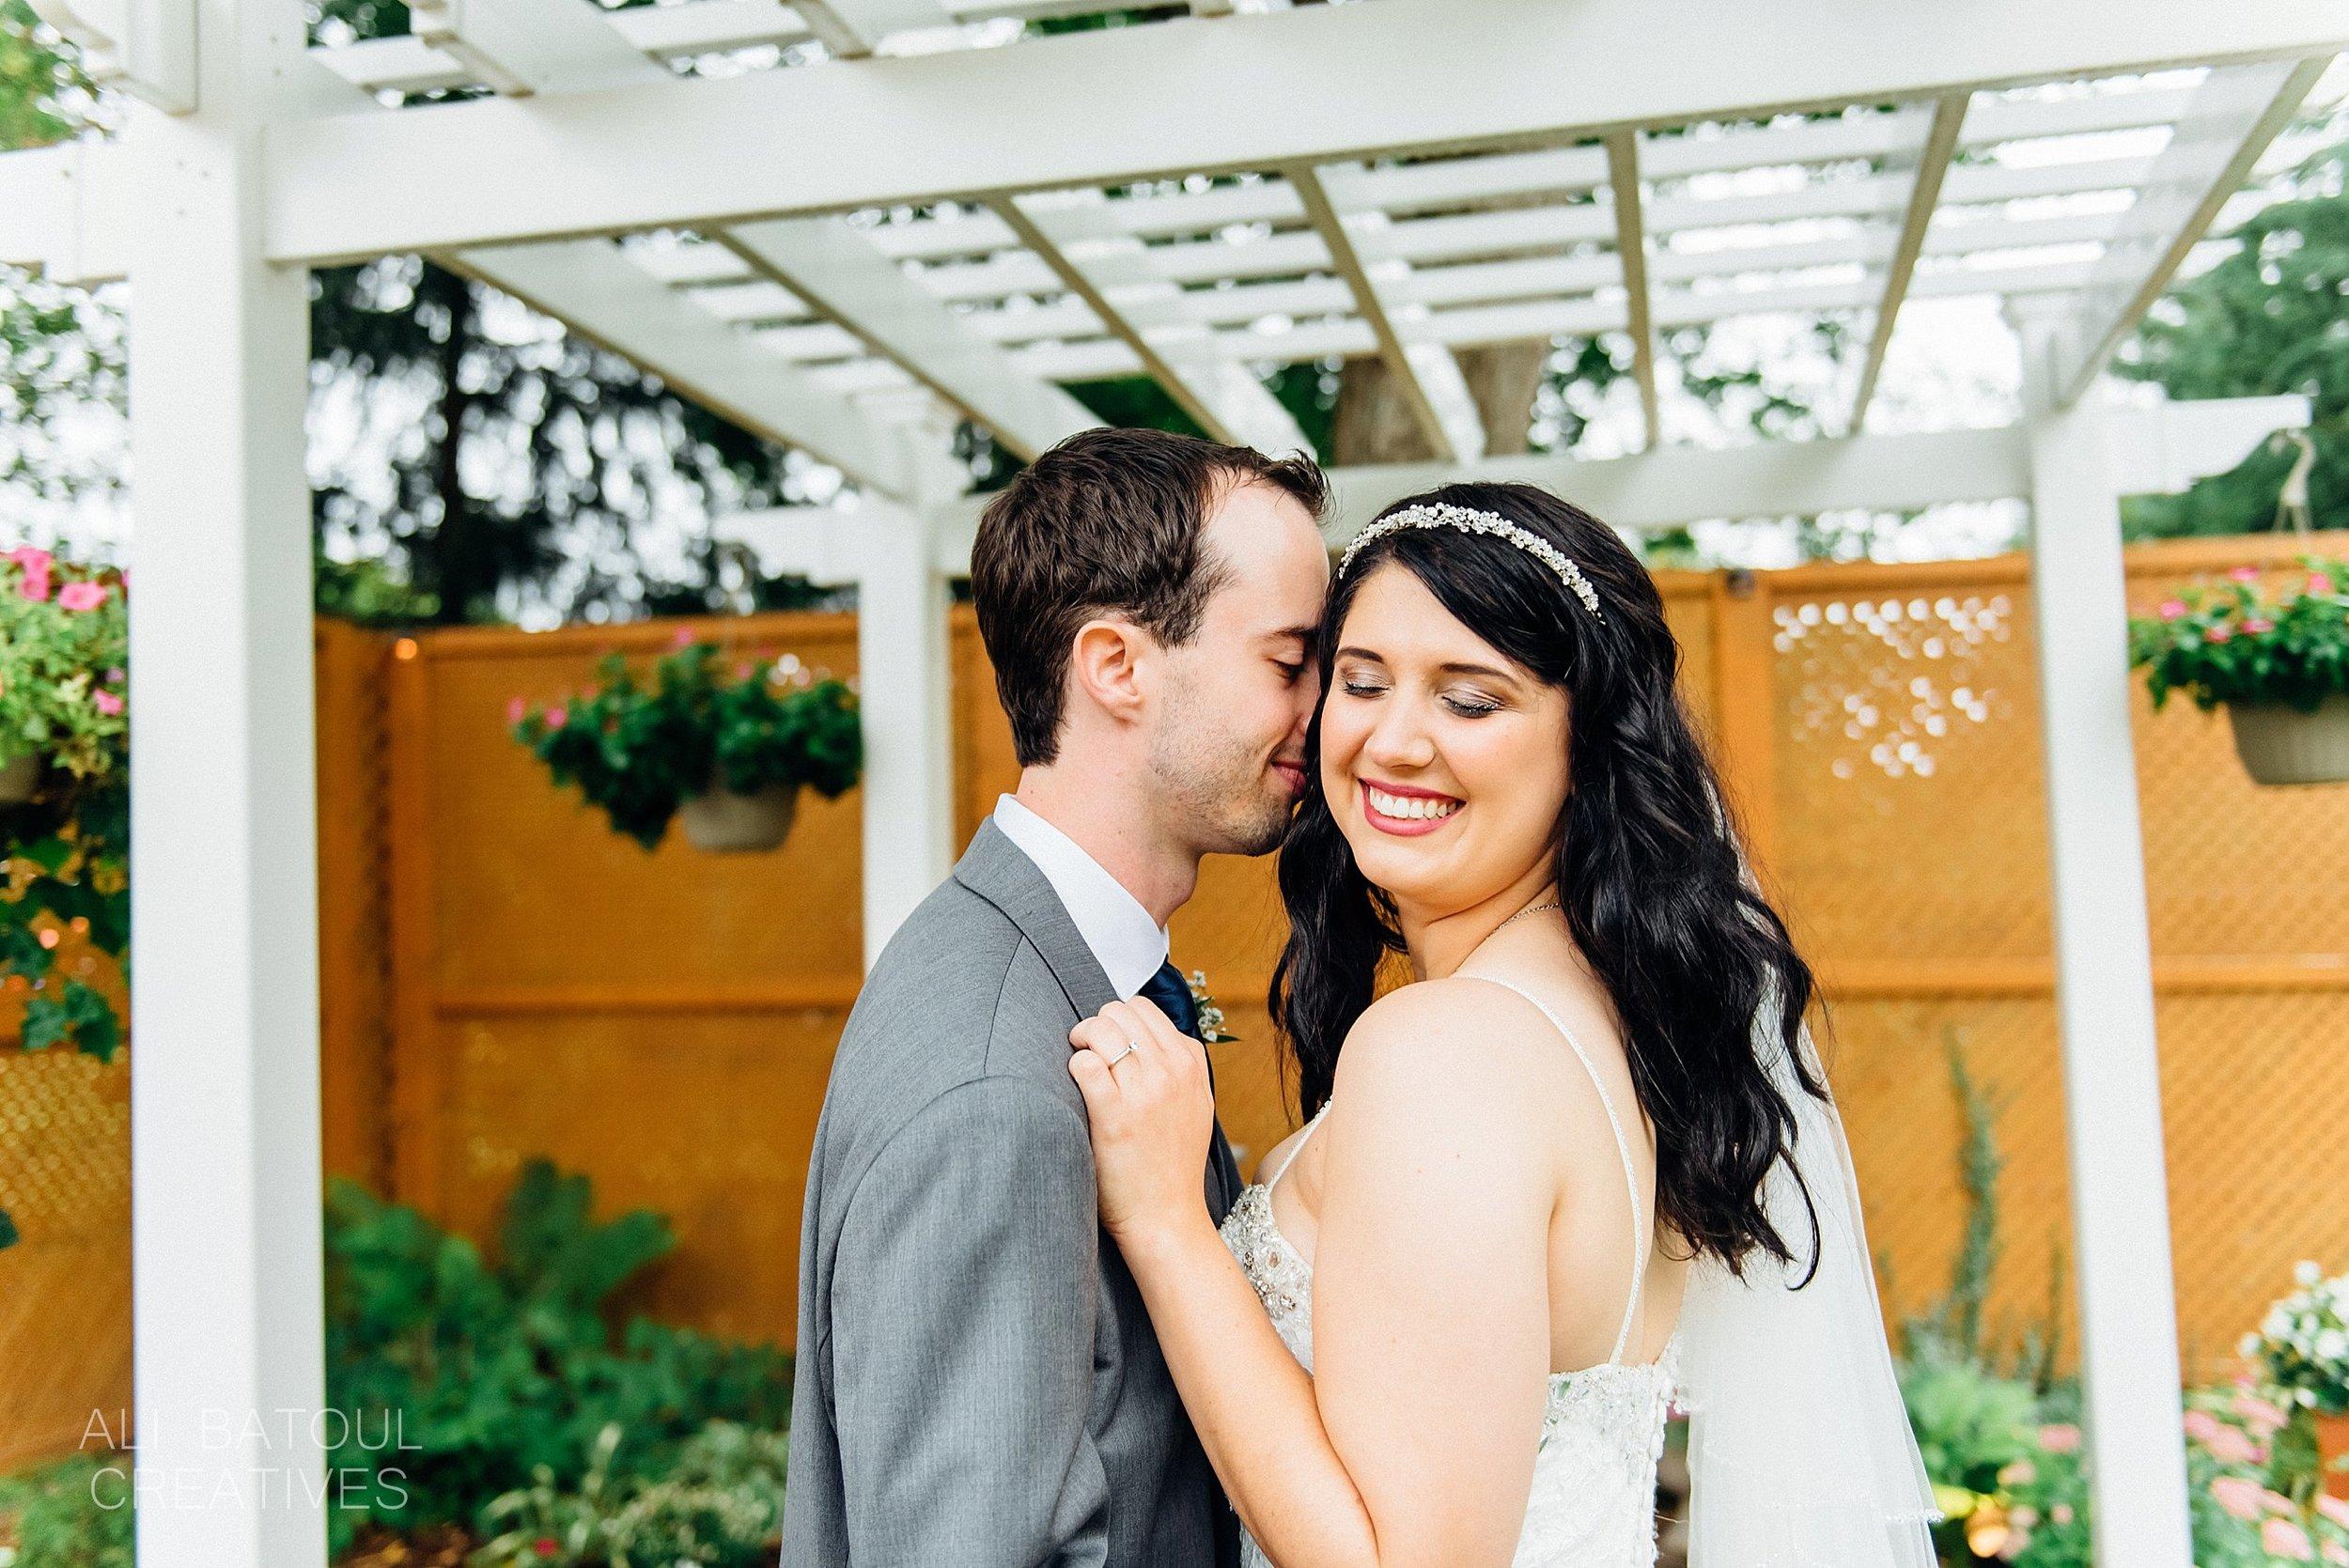 Jocelyn + Steve At The Schoolhouse Wedding - Ali and Batoul Fine Art Wedding Photography_0050.jpg